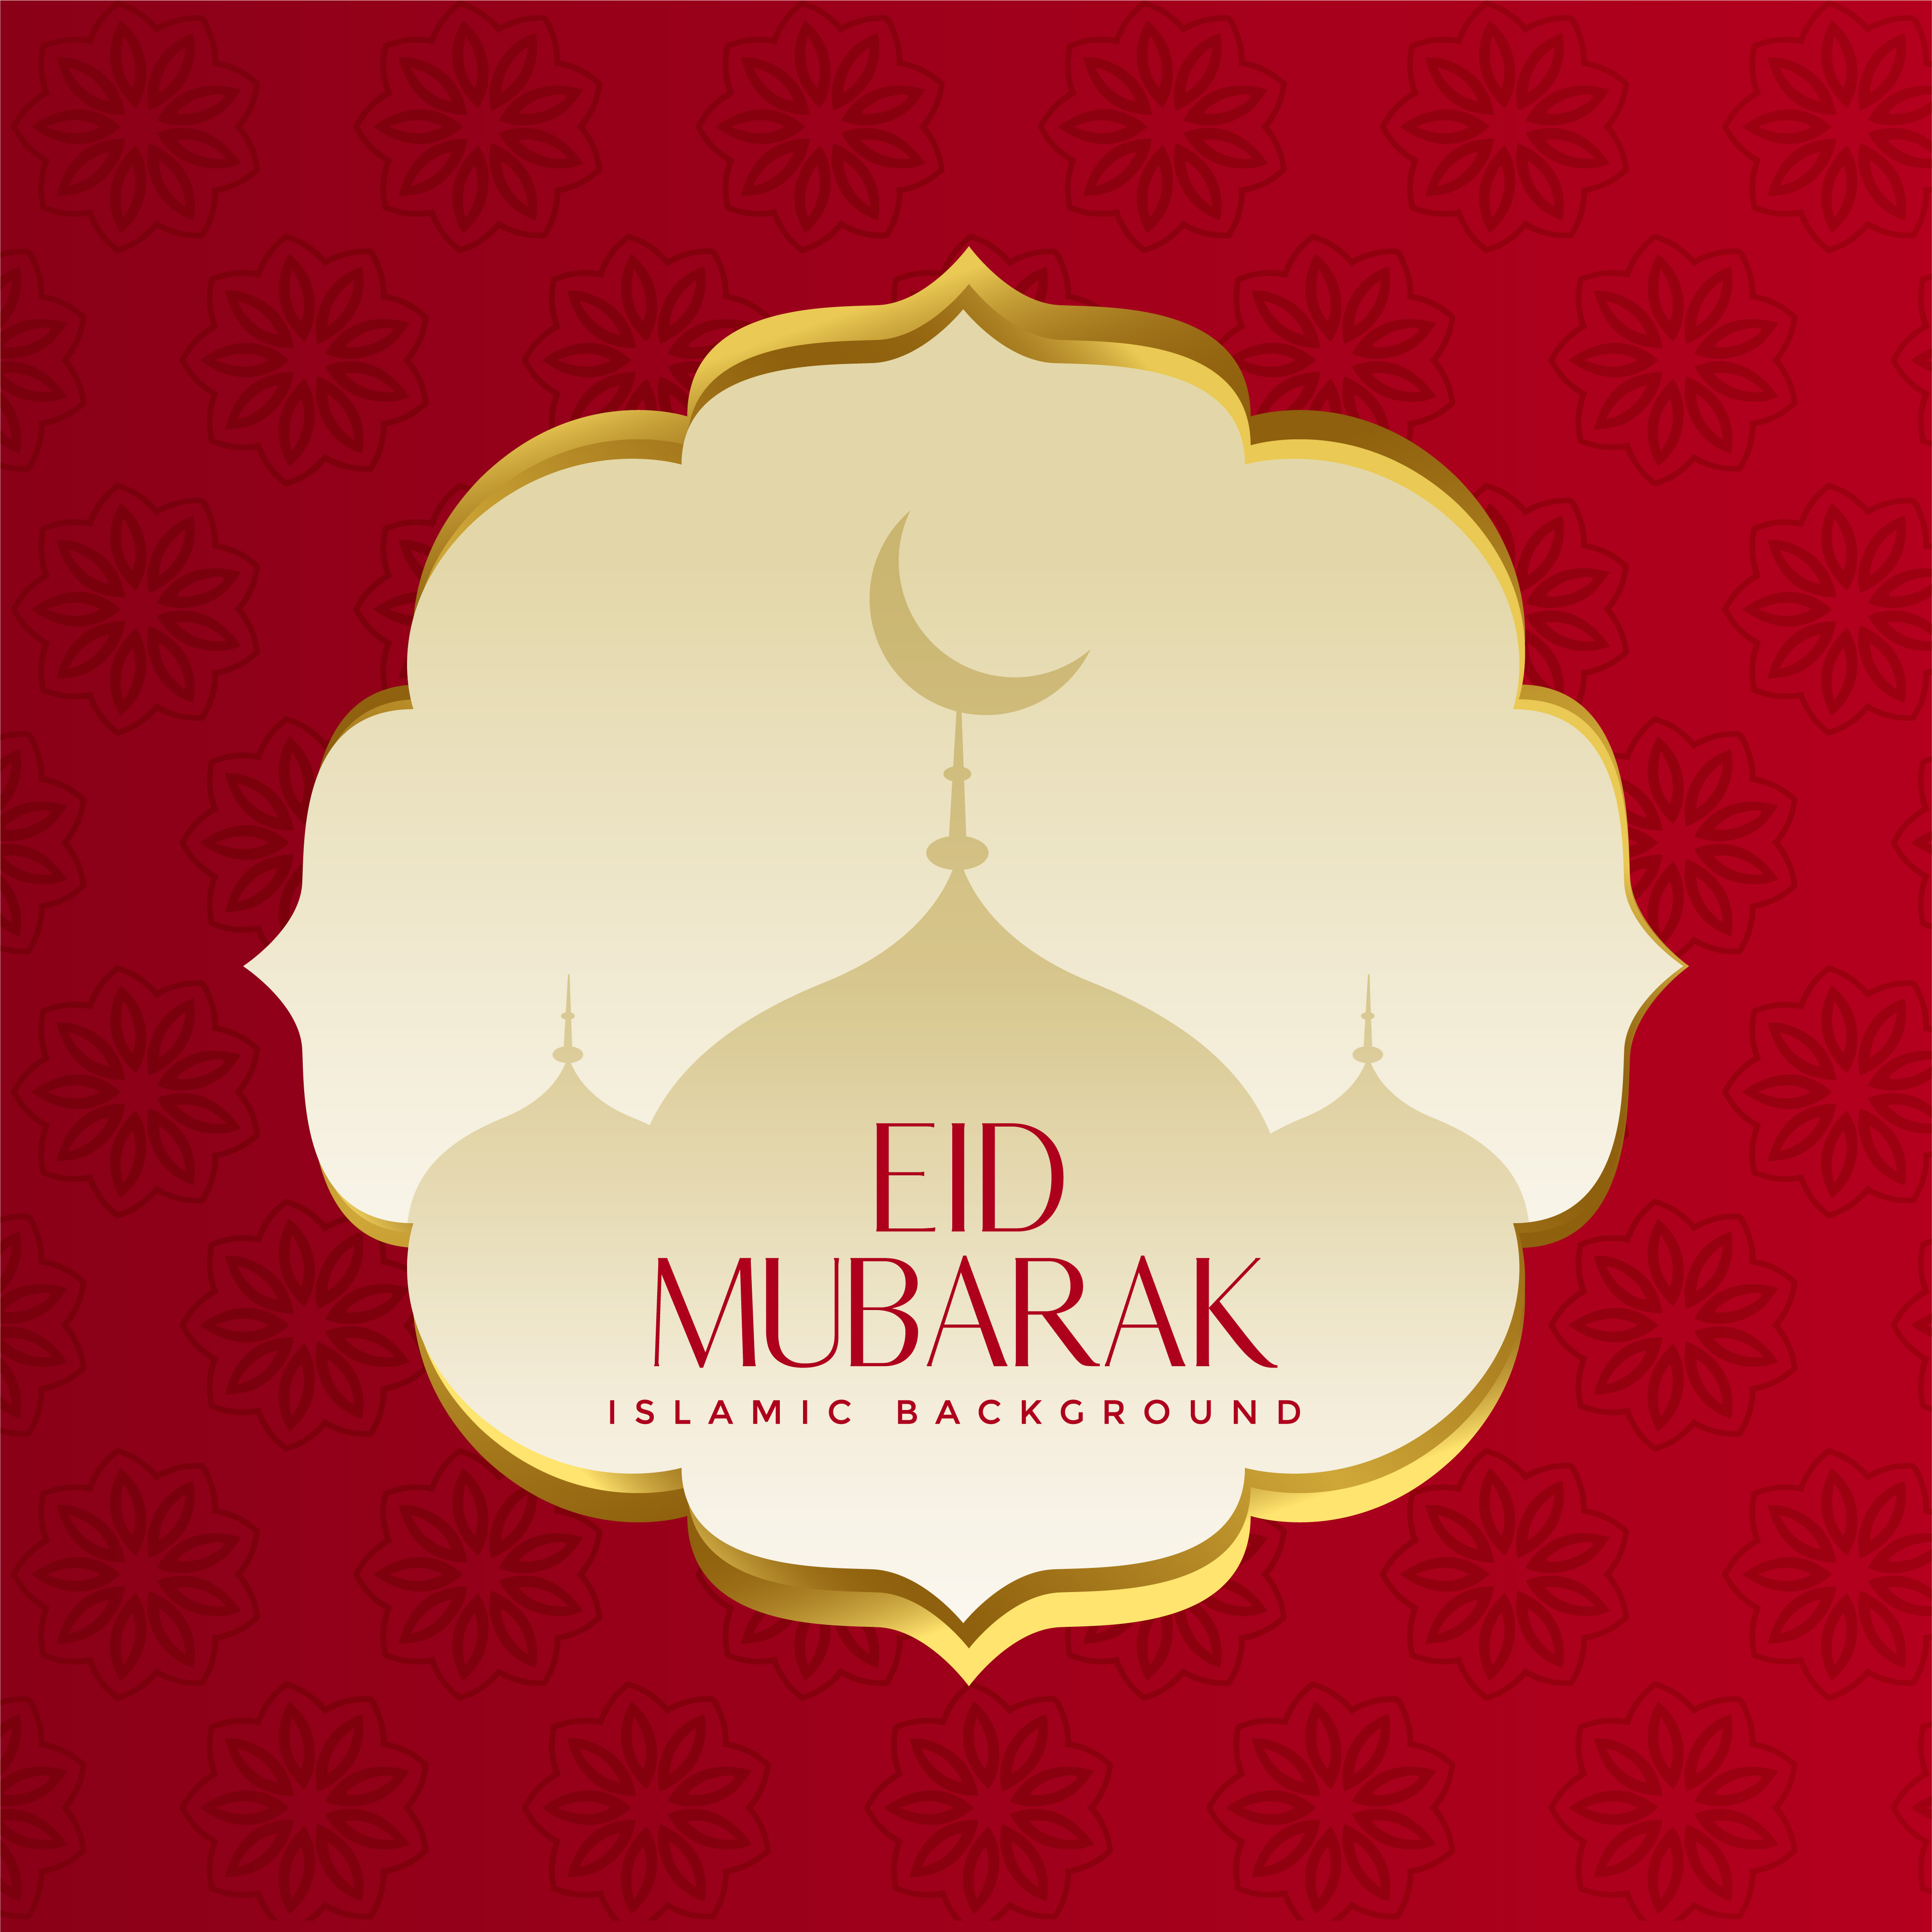 Muslim Islamic Eid Festival Greeting Design Download Free Vector